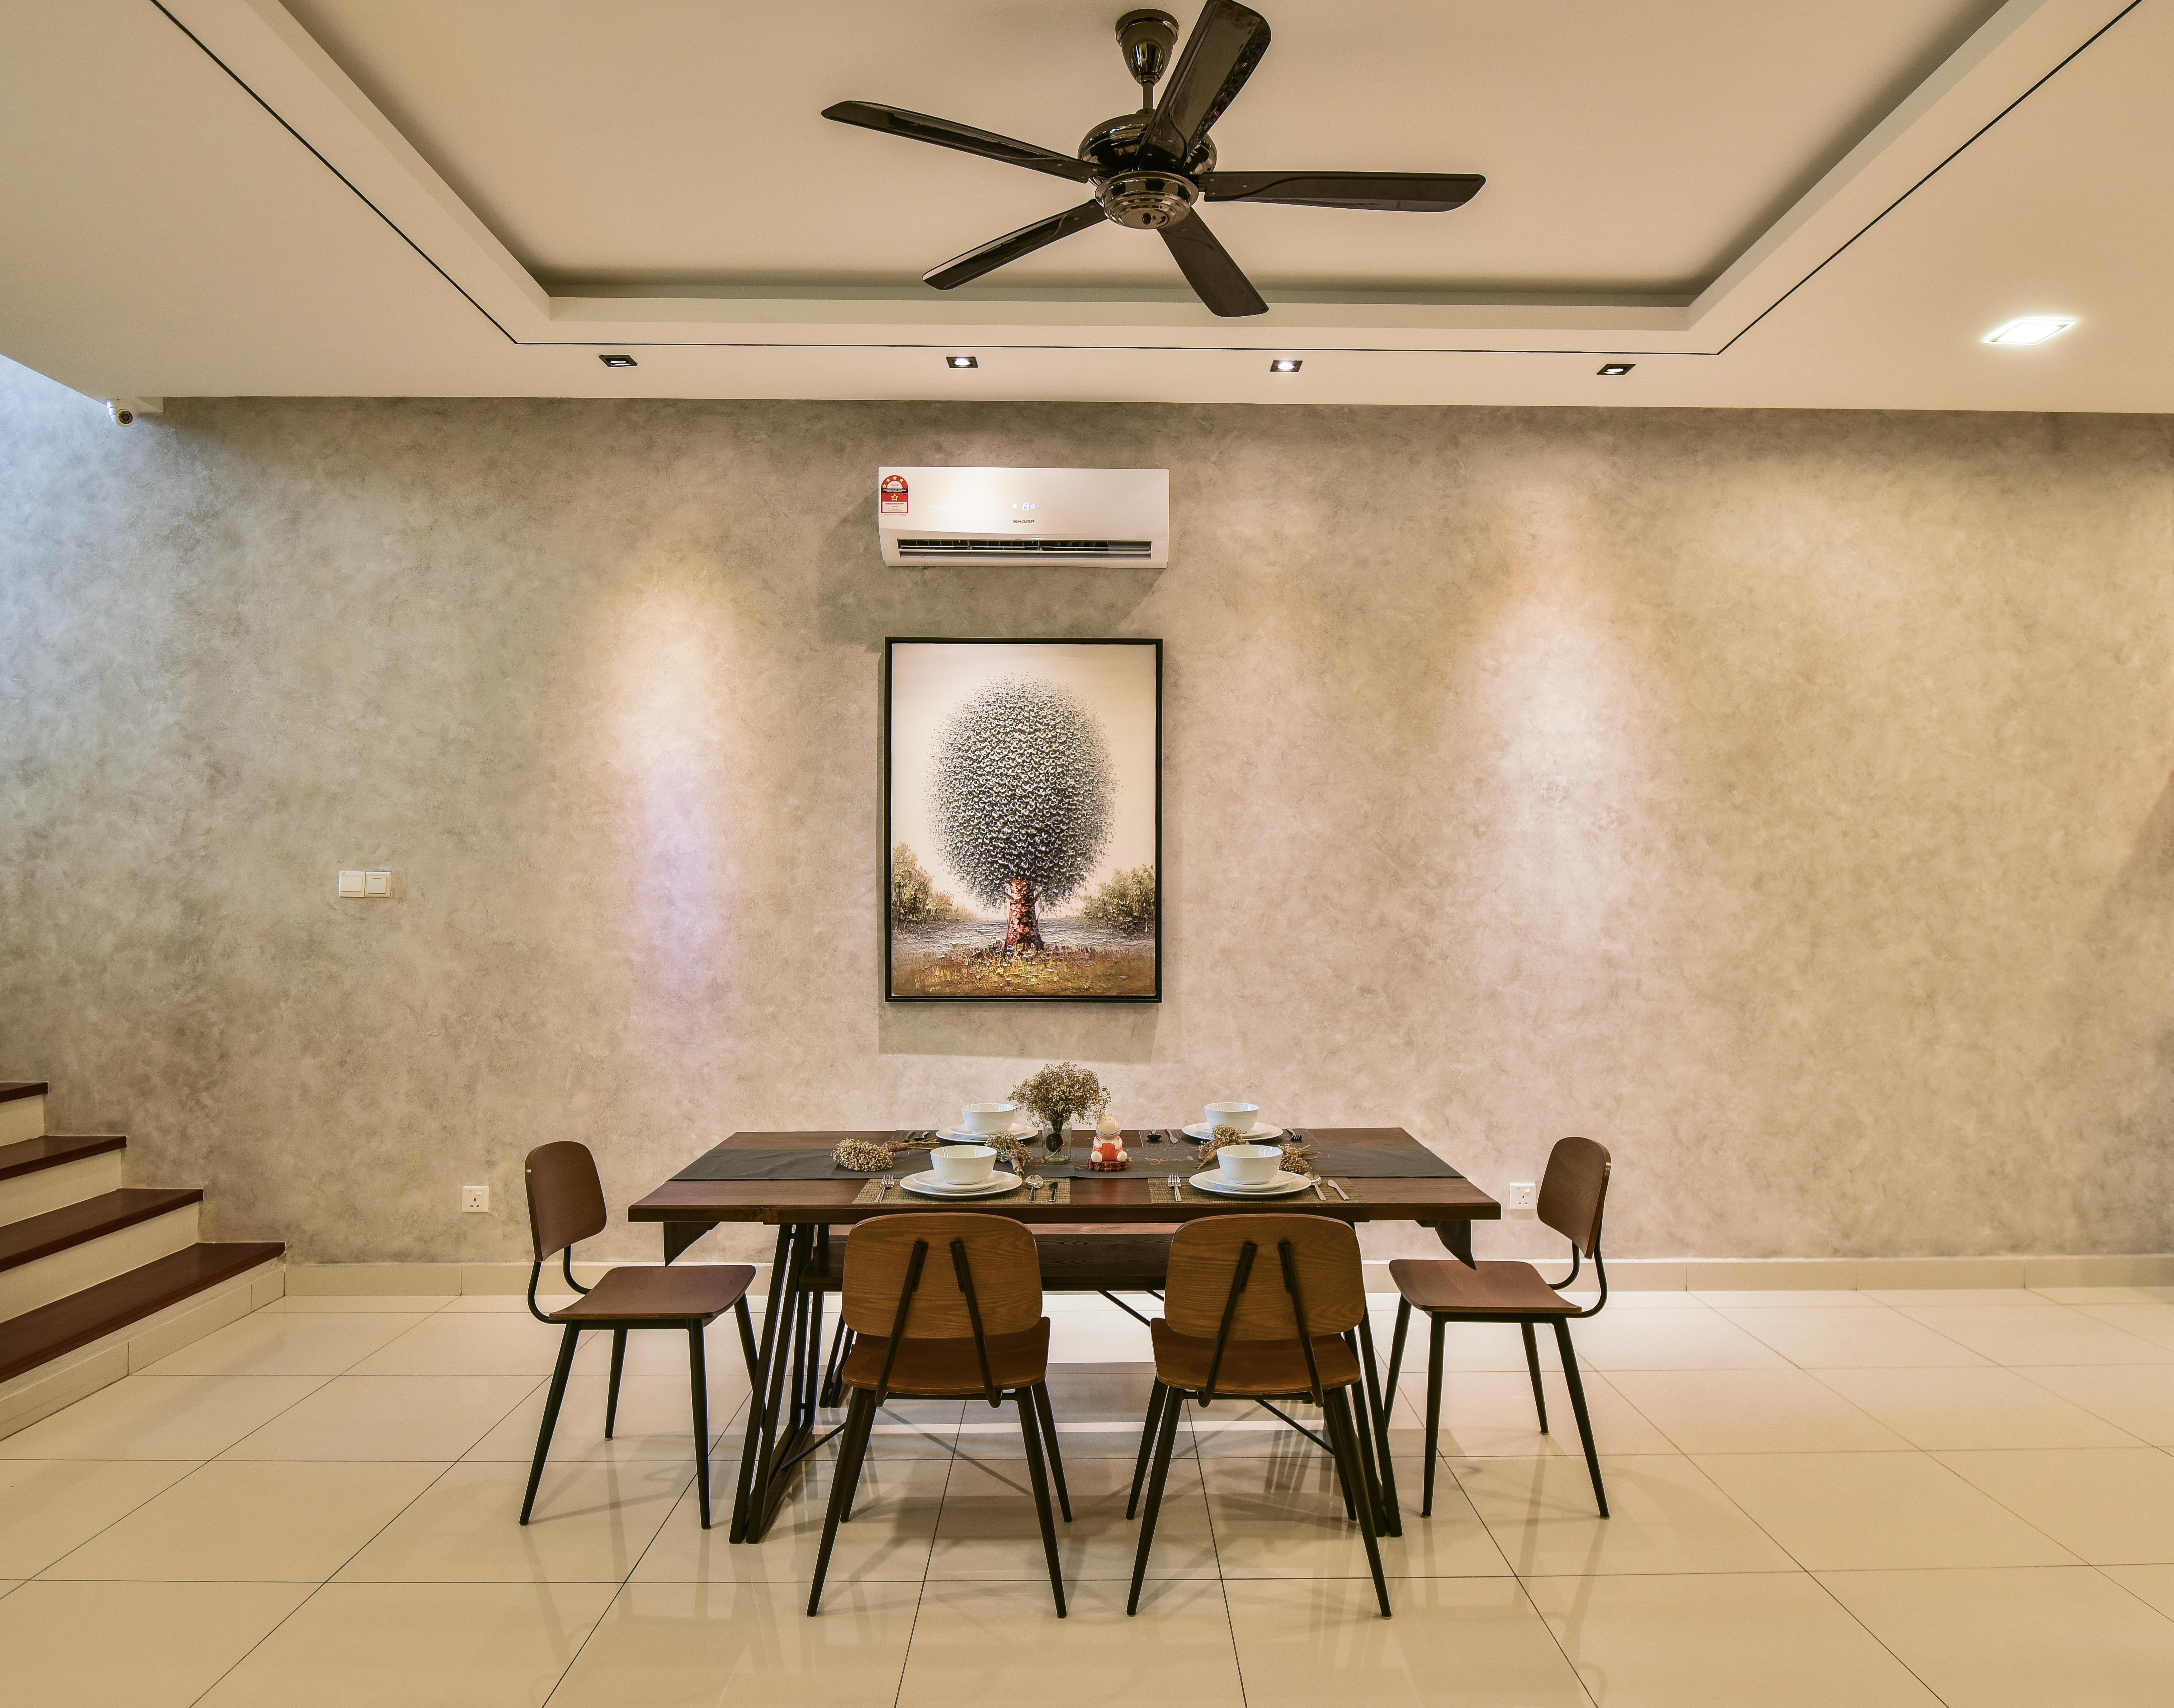 TemasyaResidential interior design renovation malaysia